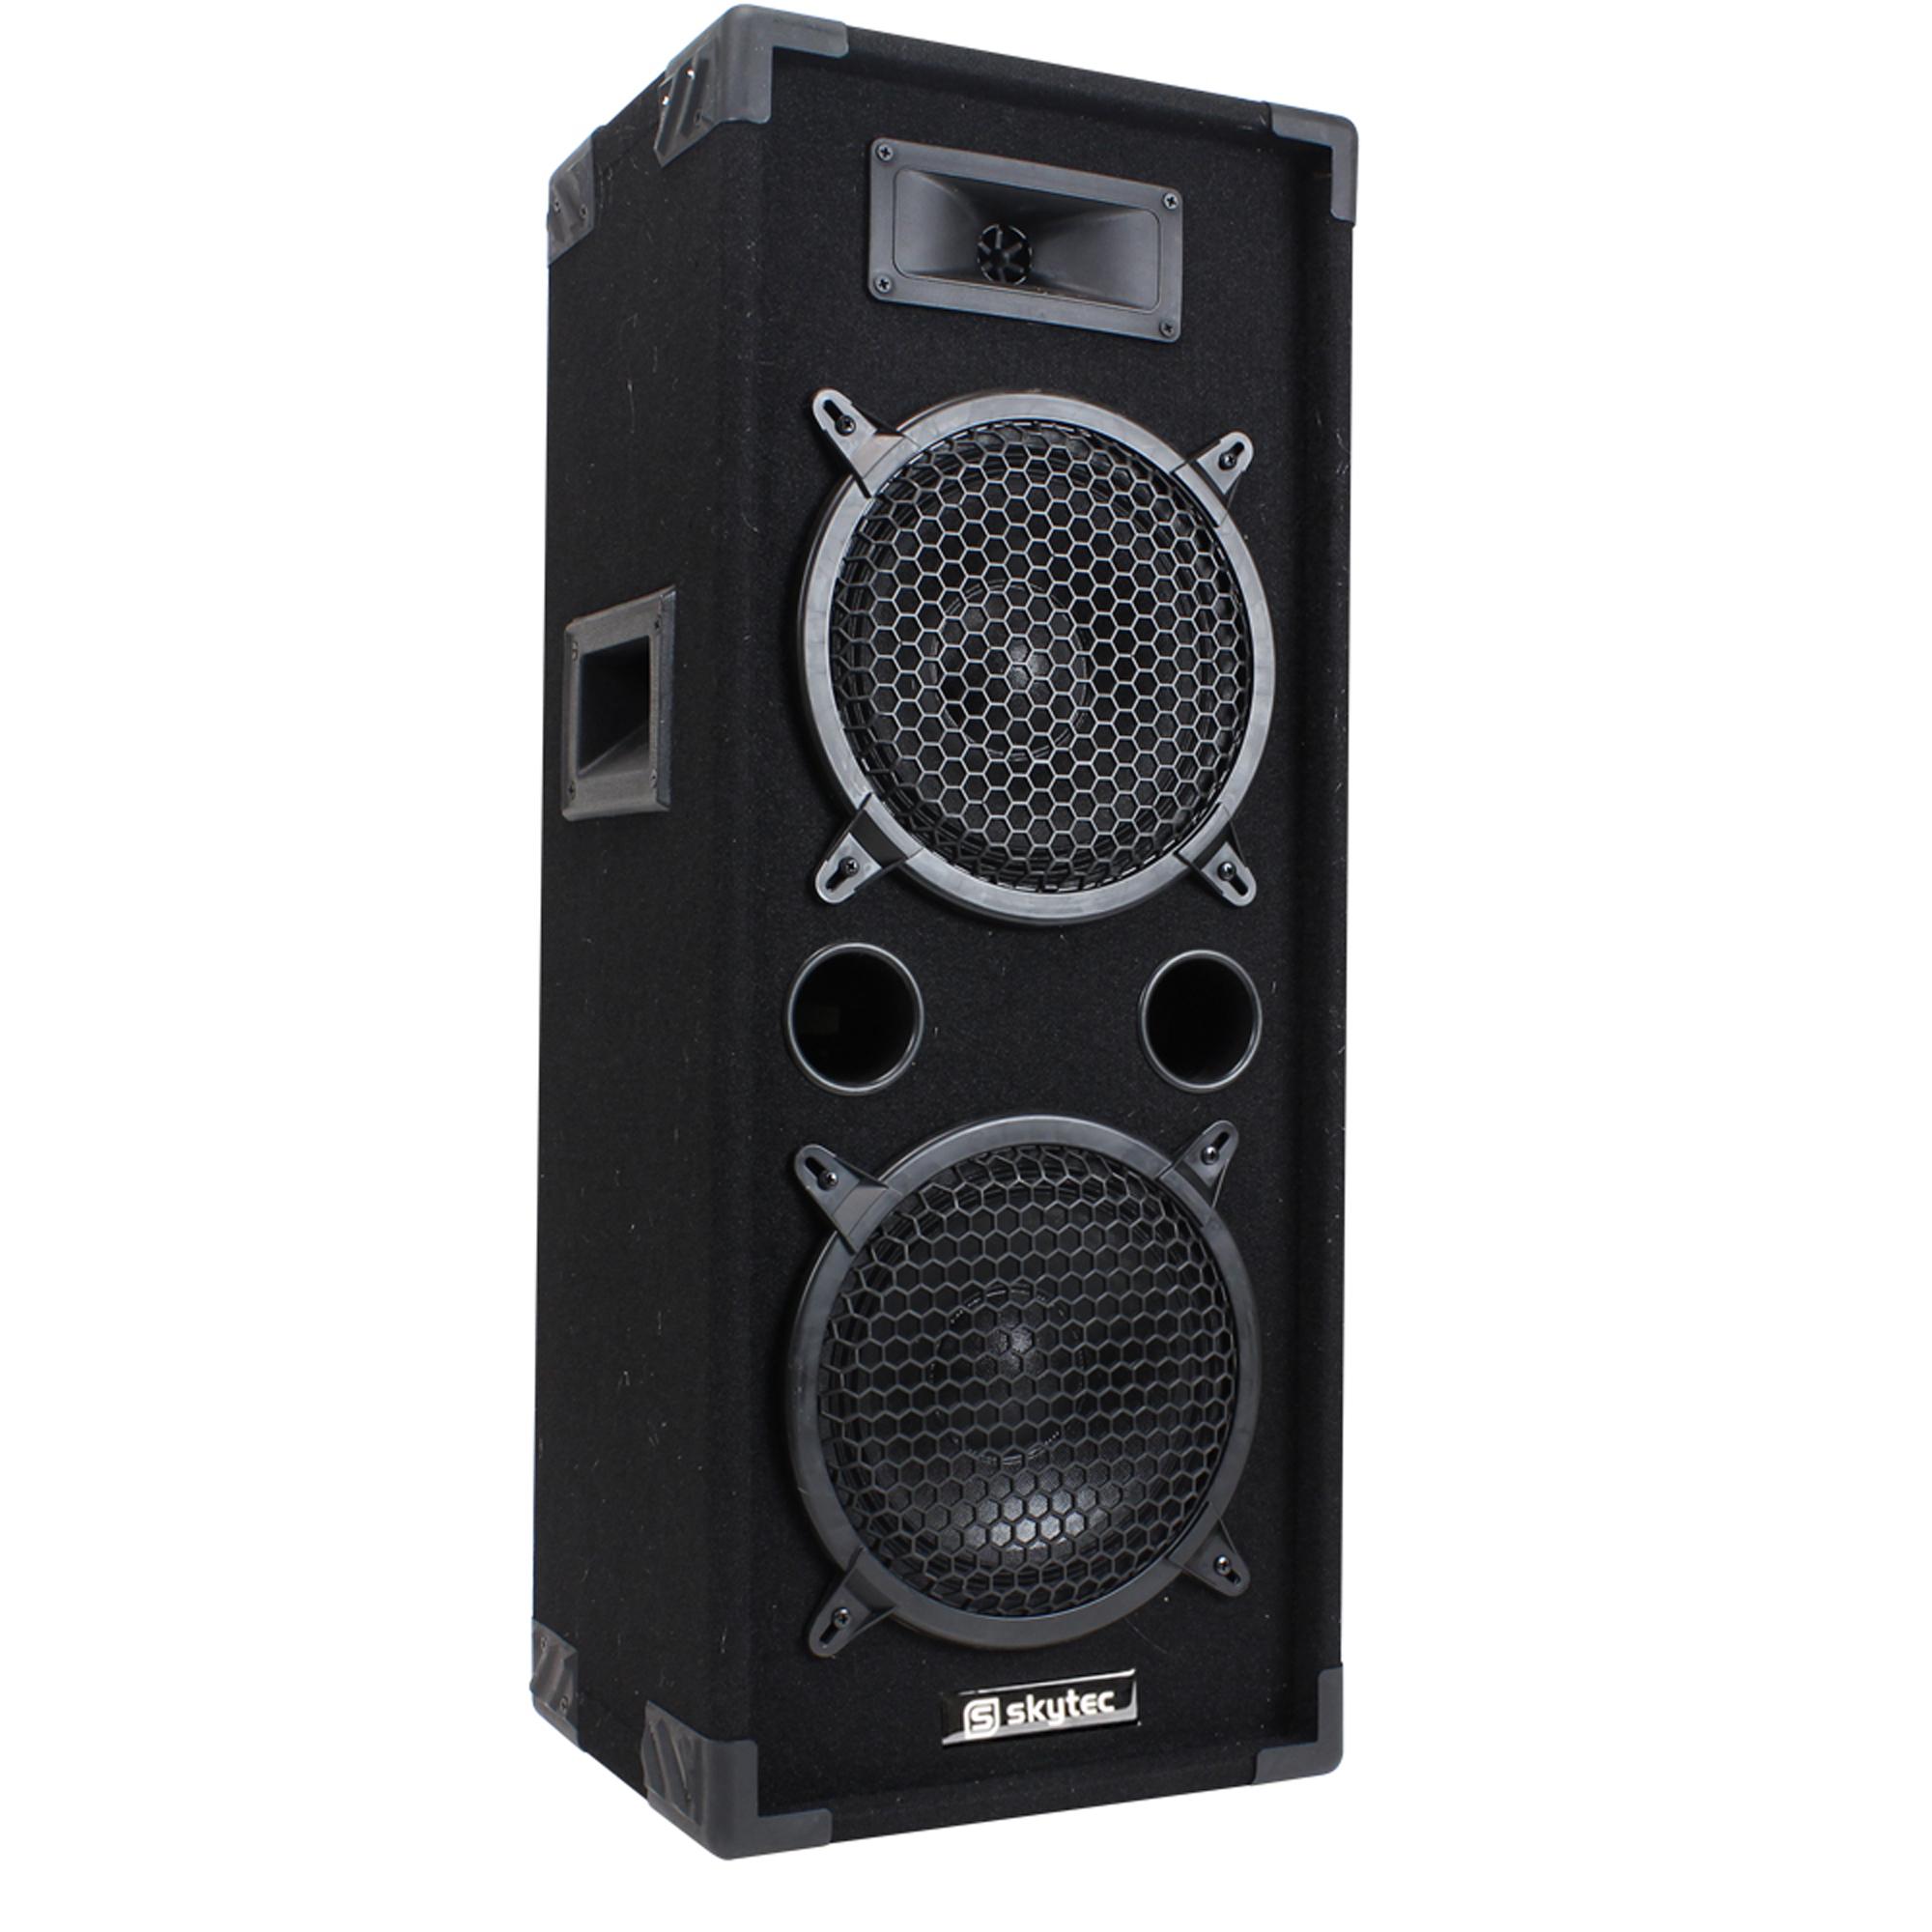 Fine Skytec 2 X 8 Inch Passive Speaker Bedroom Dj Home Audio Hi Fi Disco Party 800W Download Free Architecture Designs Rallybritishbridgeorg